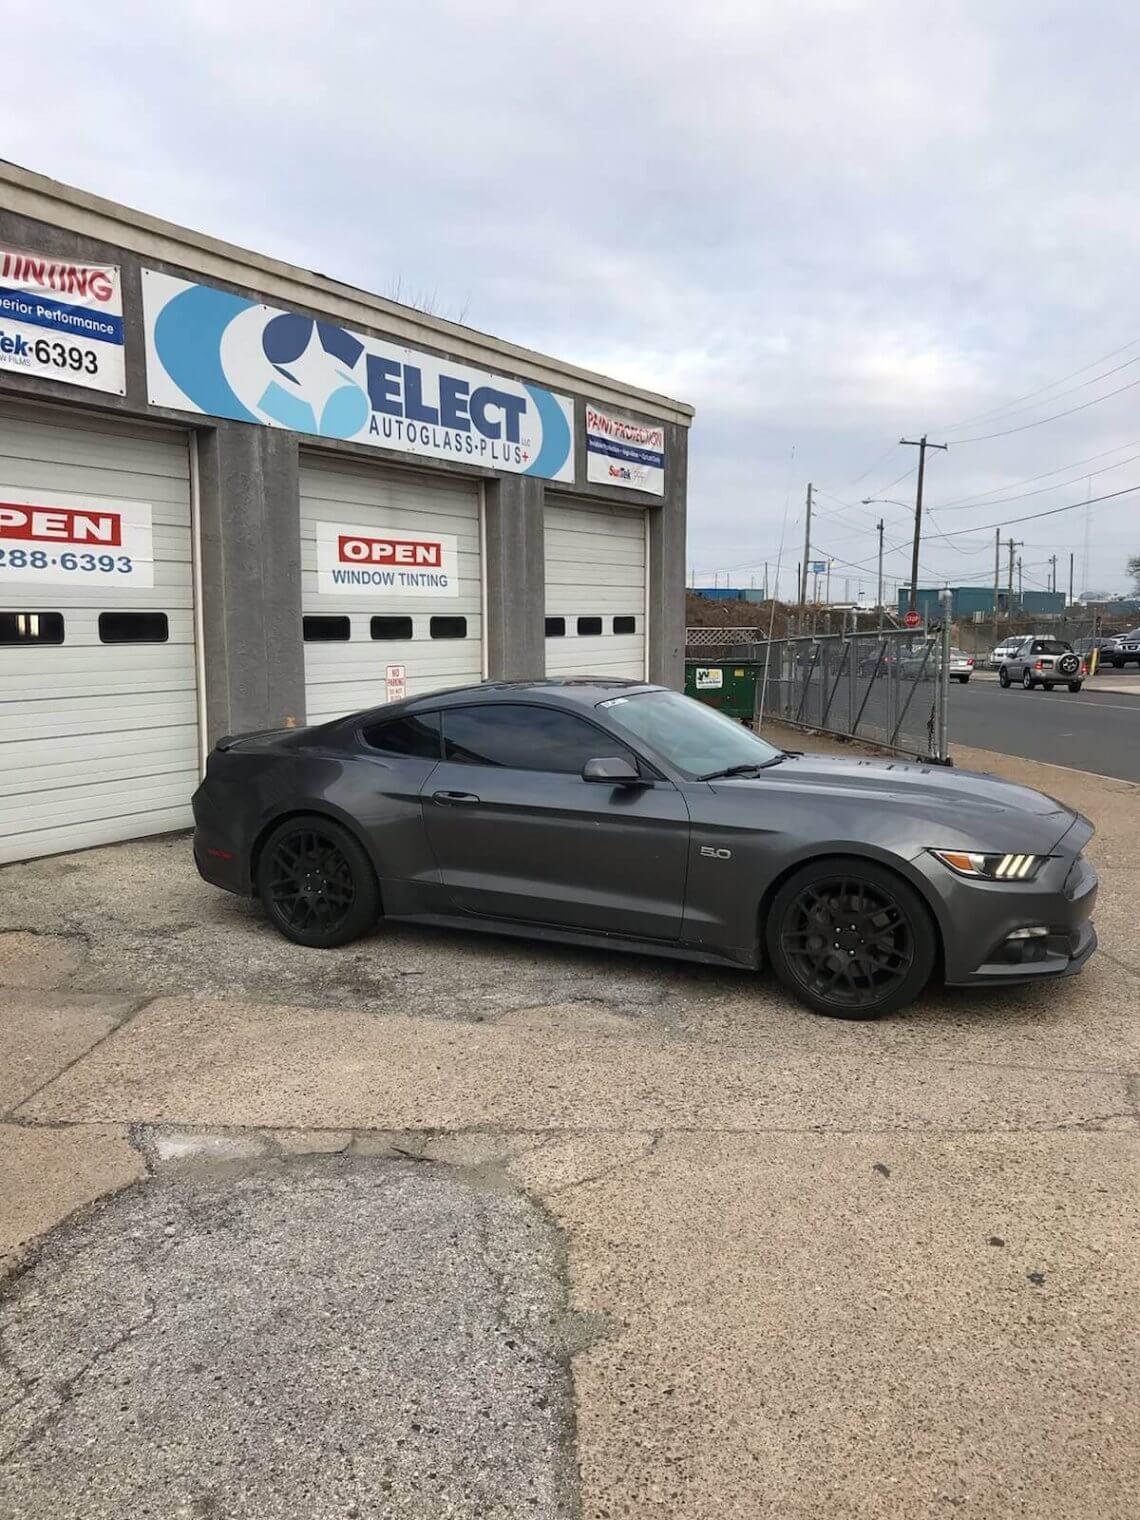 2016 Ford Mustang 15 Tint Select Autoglass Plus Llc